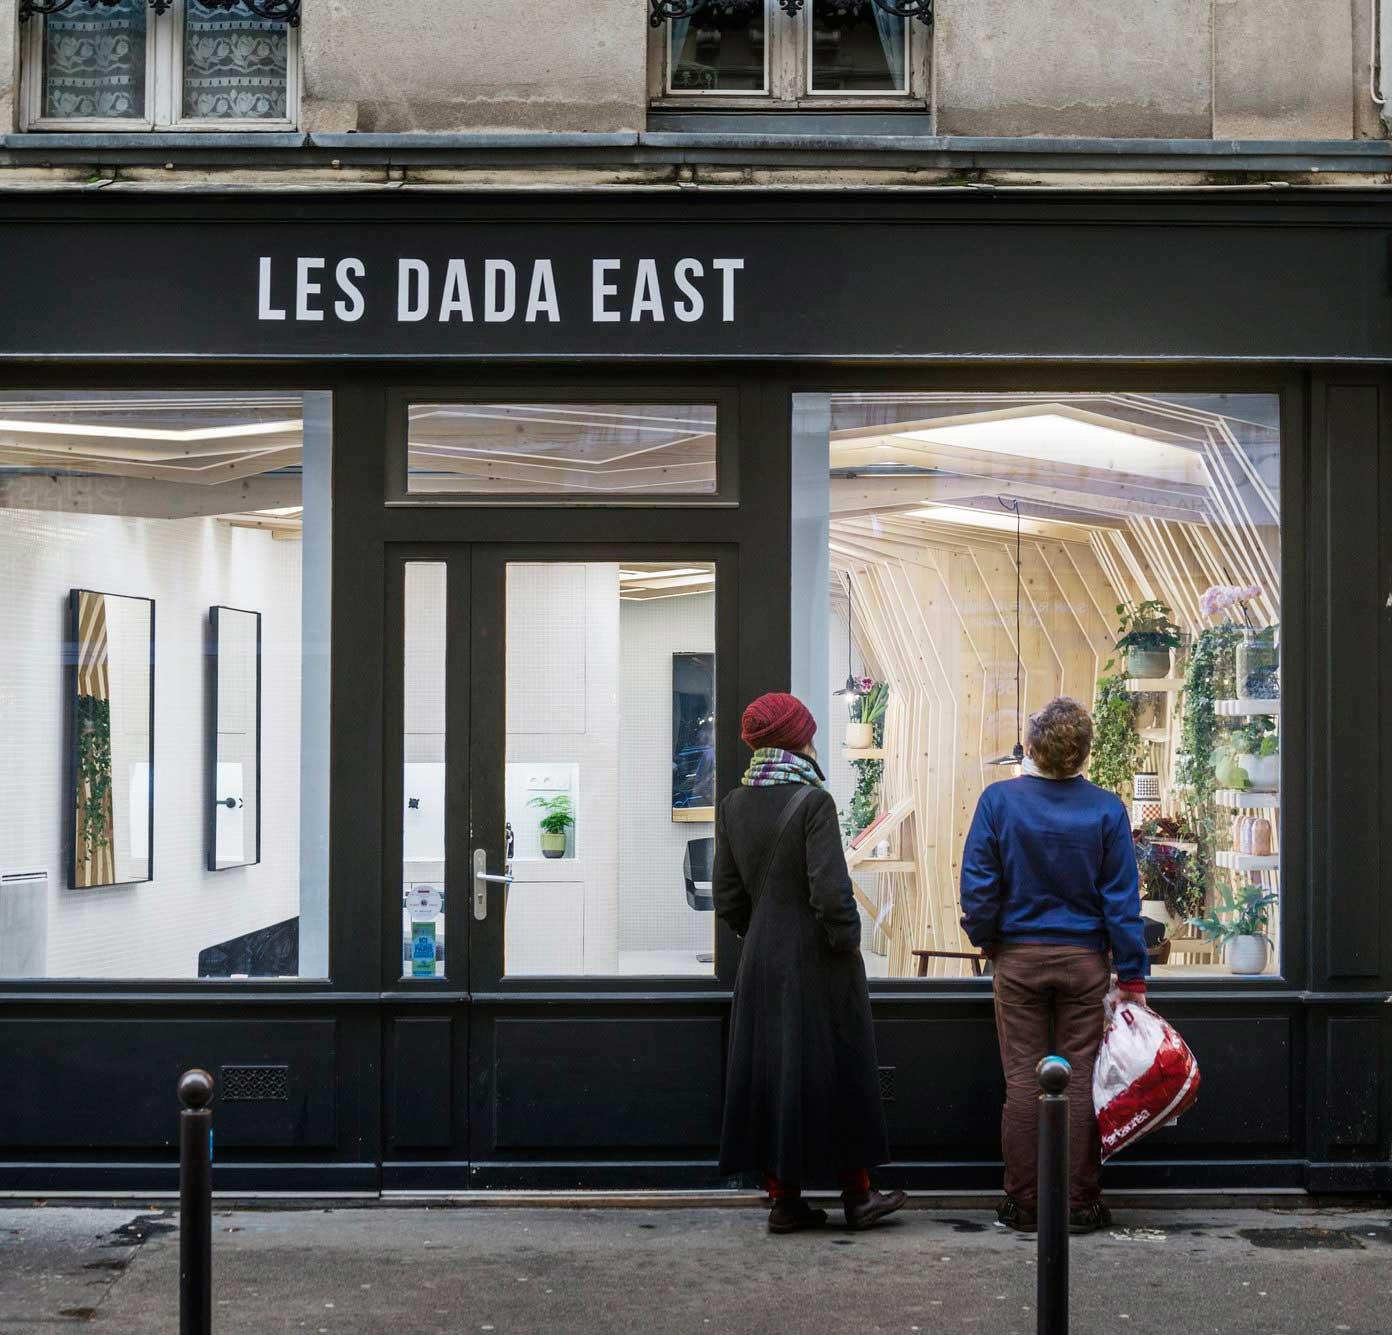 JFASTUDIO - Les Dada East Popincourt